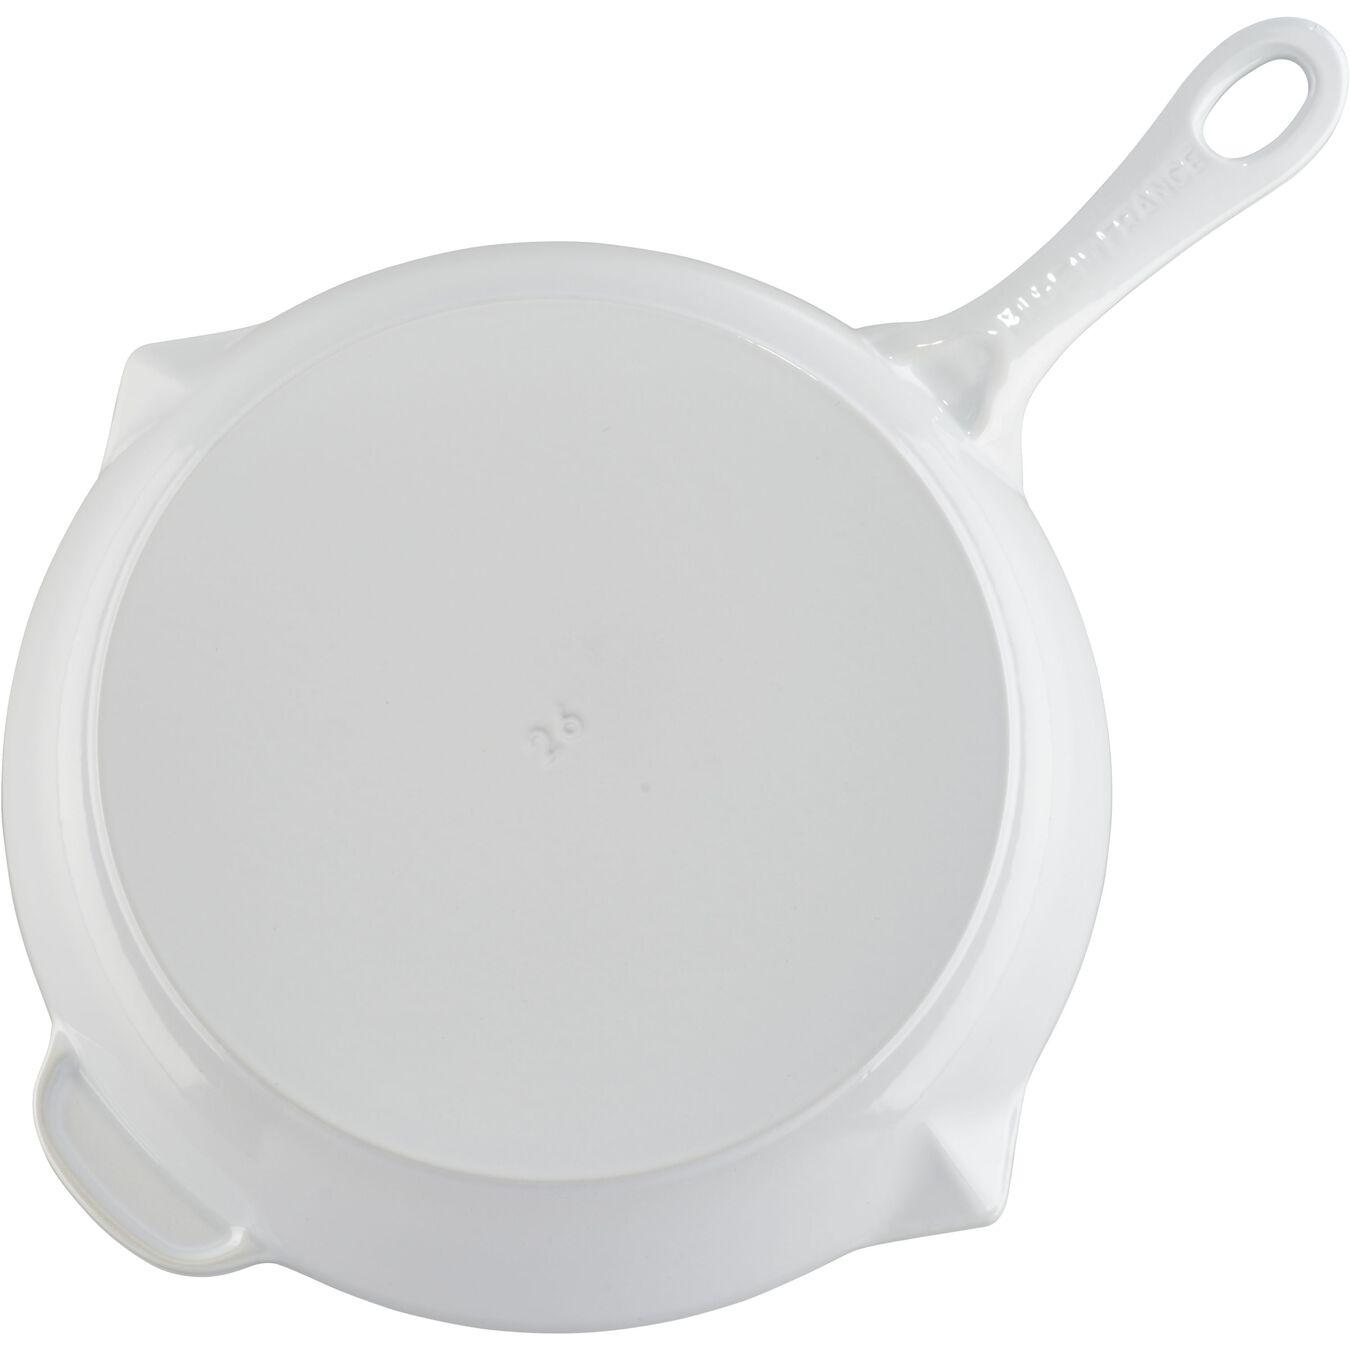 10-inch, Fry Pan, white,,large 4